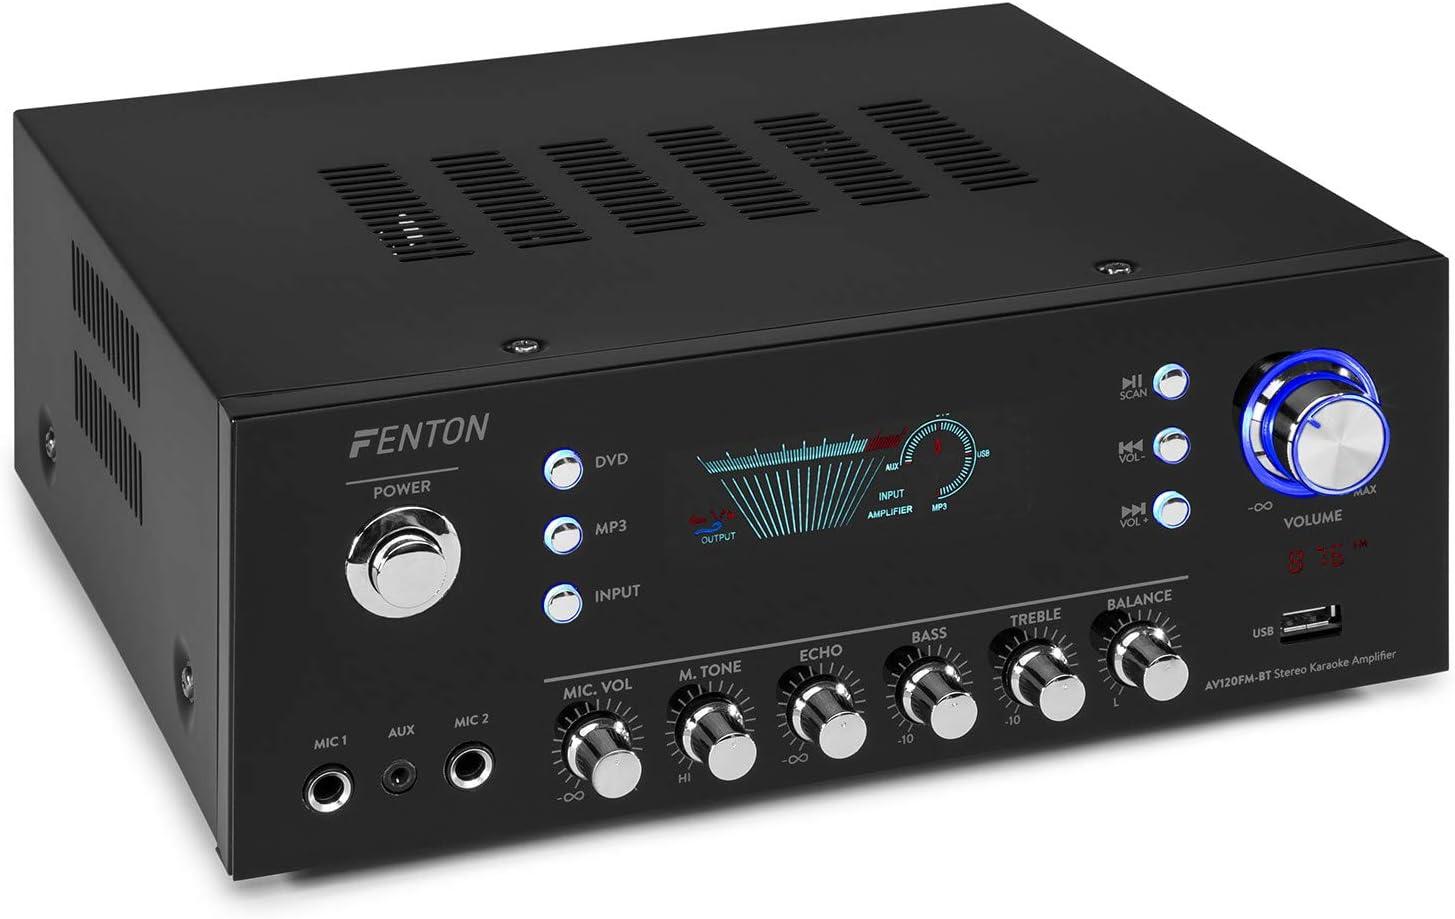 Fenton AV120FM - Amplificador estéreo HiFi (2 x 60 W RMS (8 ohmios, 4 / 8 ohmios, Bluetooth, USB, Radio FM, Pantalla Digital, Echo / Bass / Treble), Color Negro